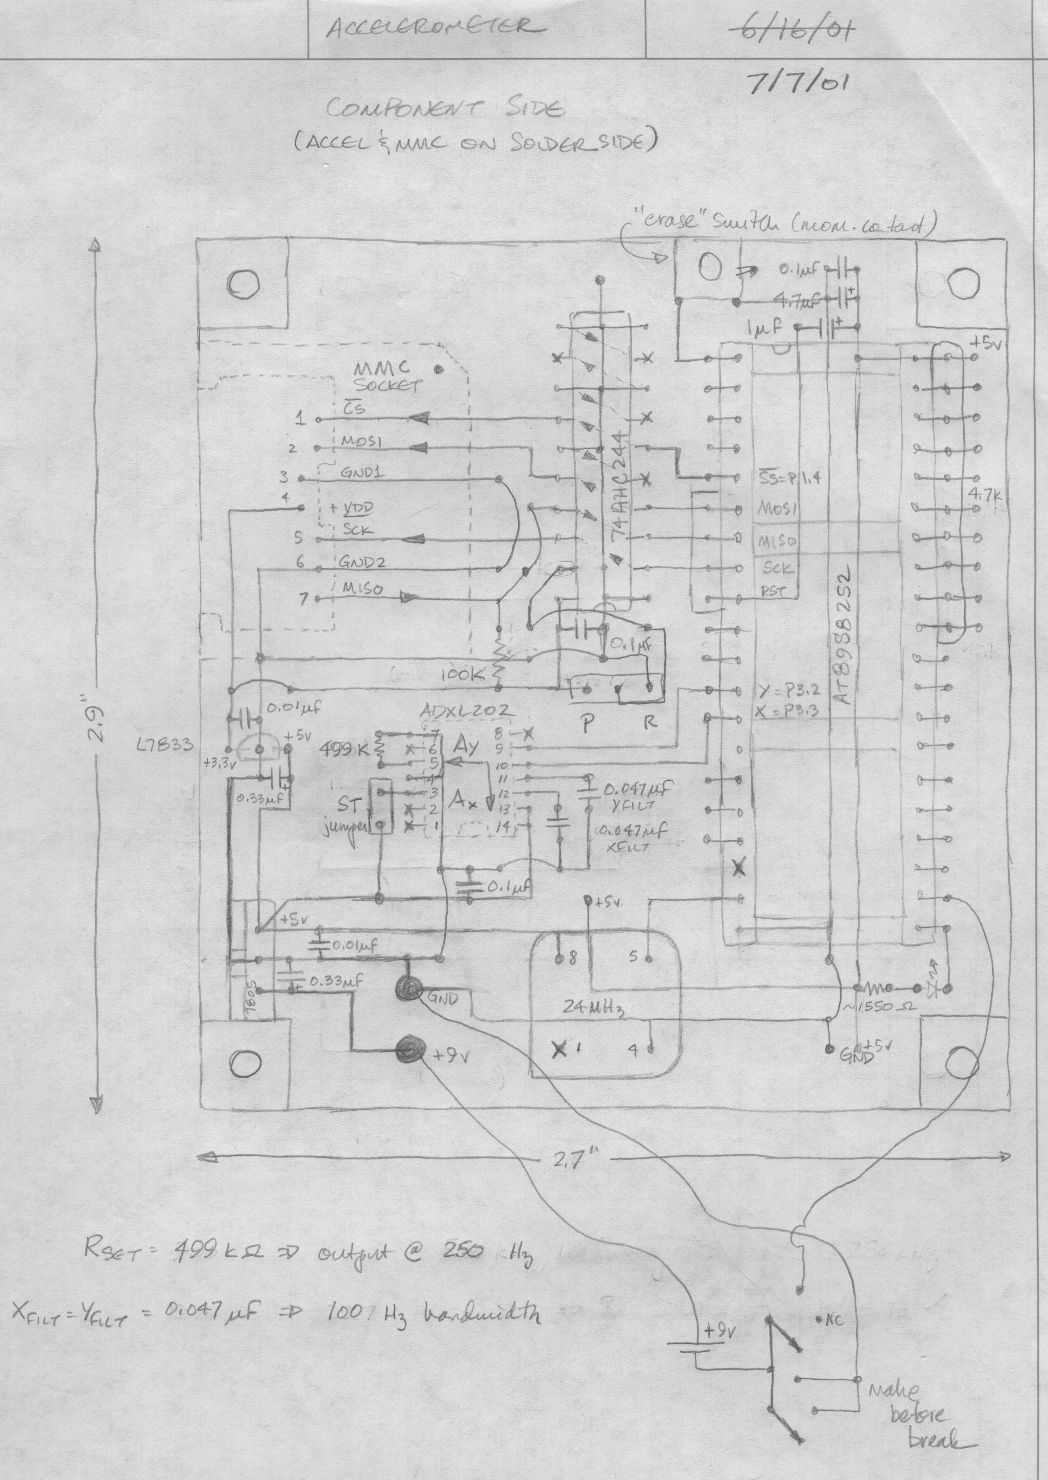 Accelerometer Schematic - schematic